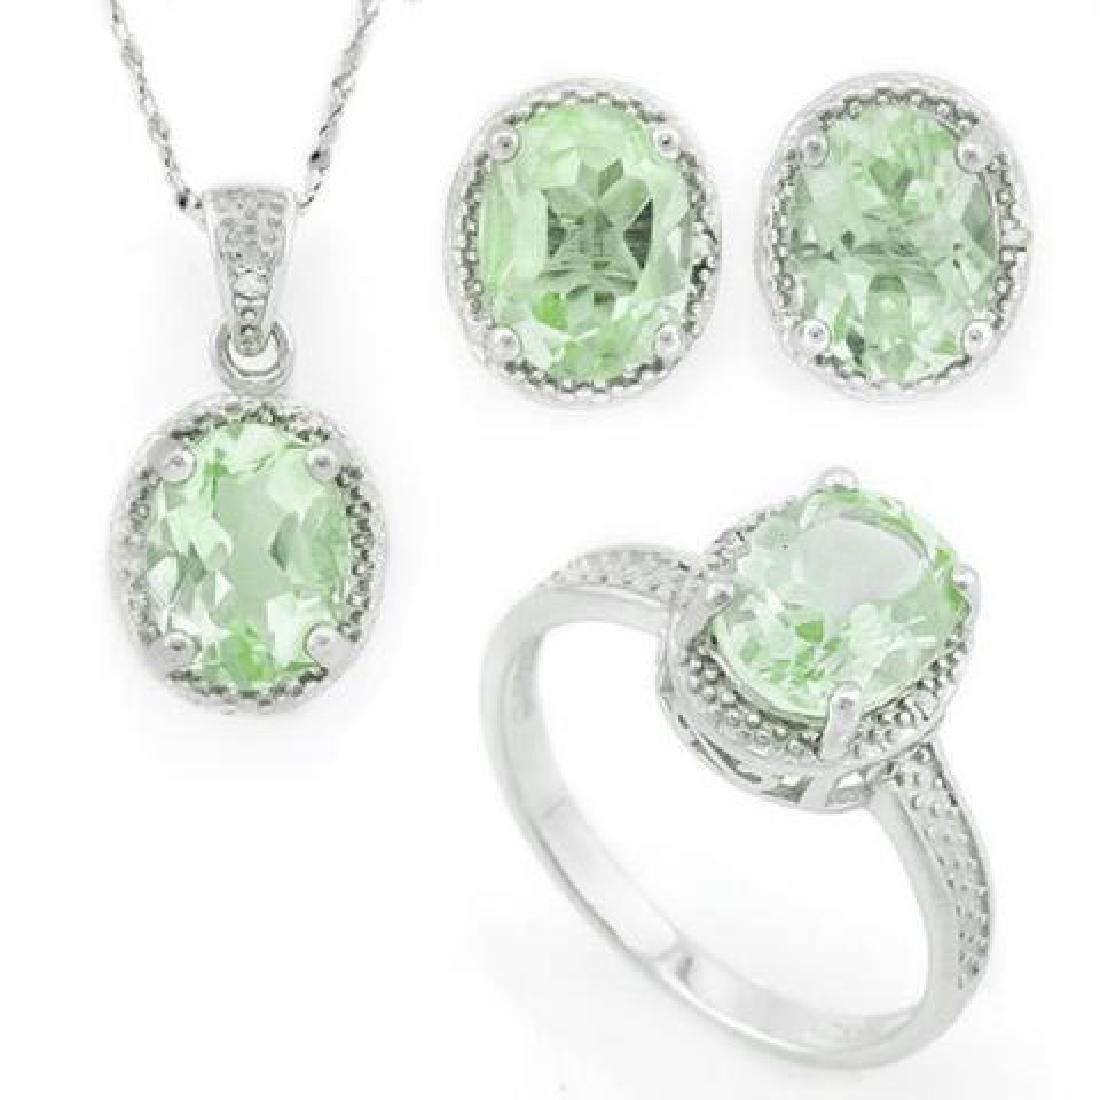 6 2/5 CARAT GREEN AMETHYST  DIAMOND 925 STERLING SILVER